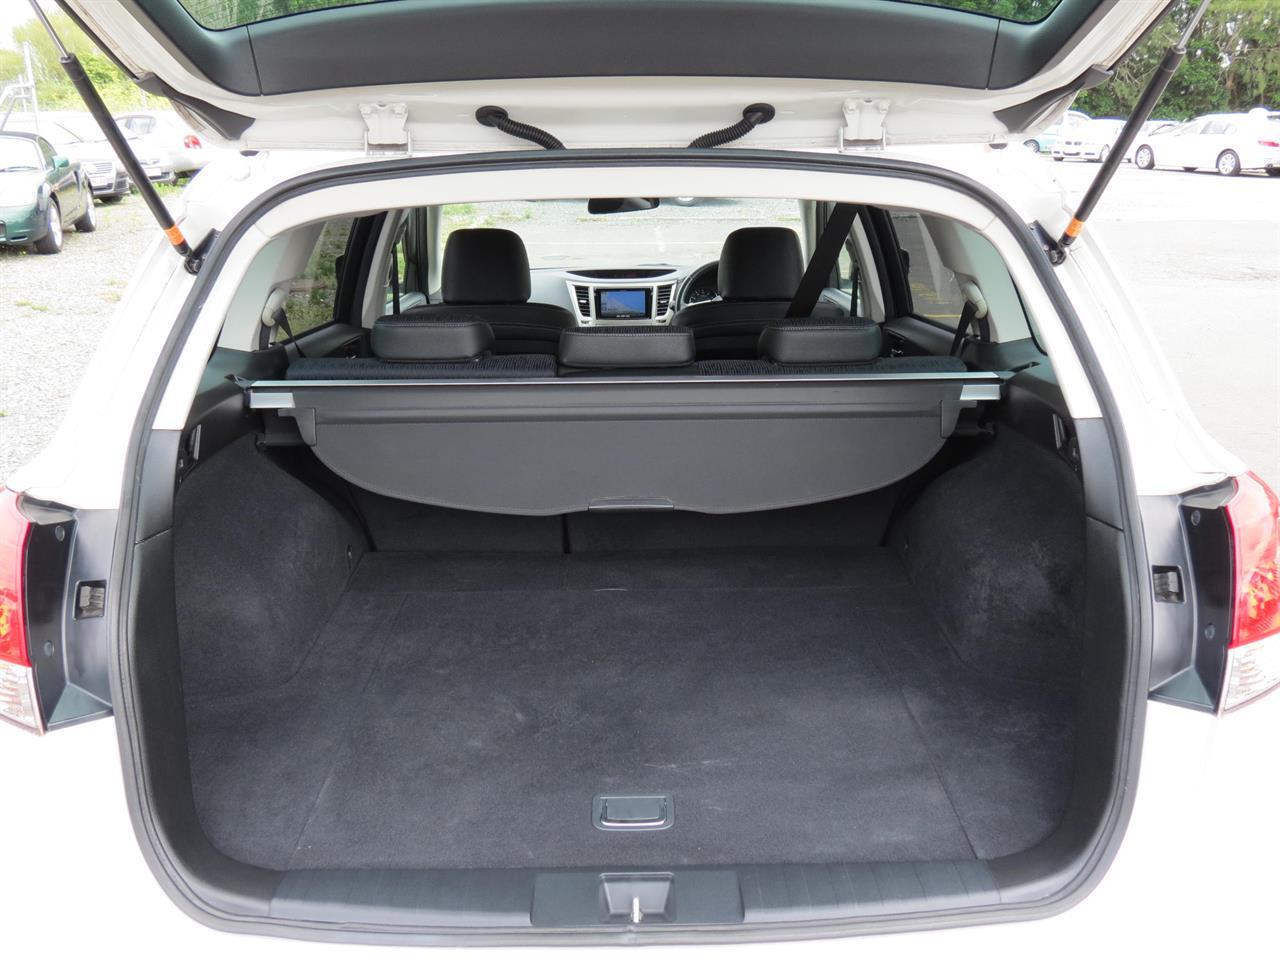 2012 Subaru Legacy | only $48 weekly